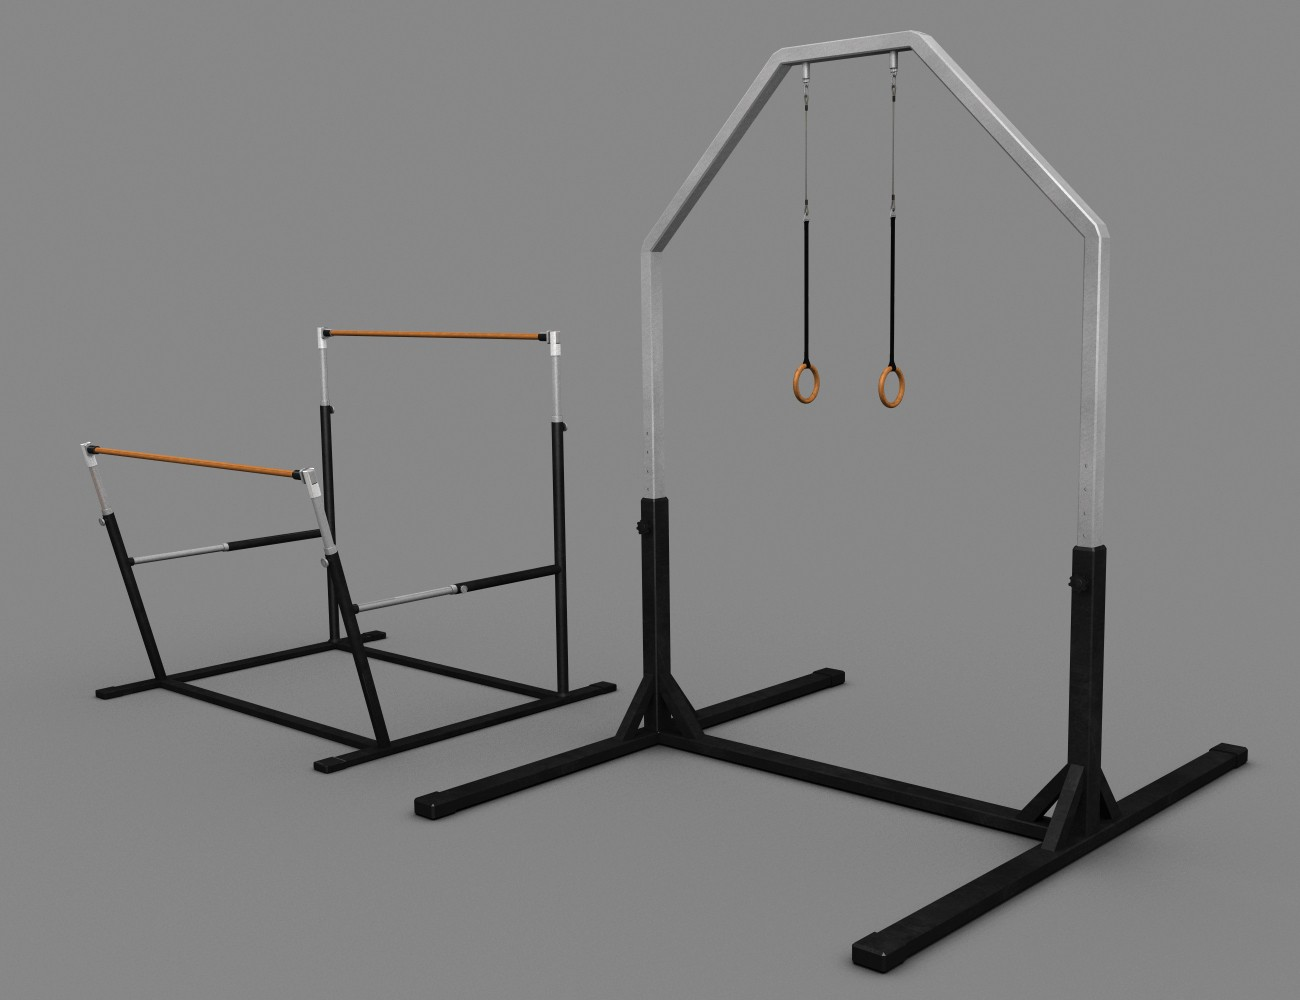 Download Daz Studio 3 For Free Daz 3d Gymnastics Equipment